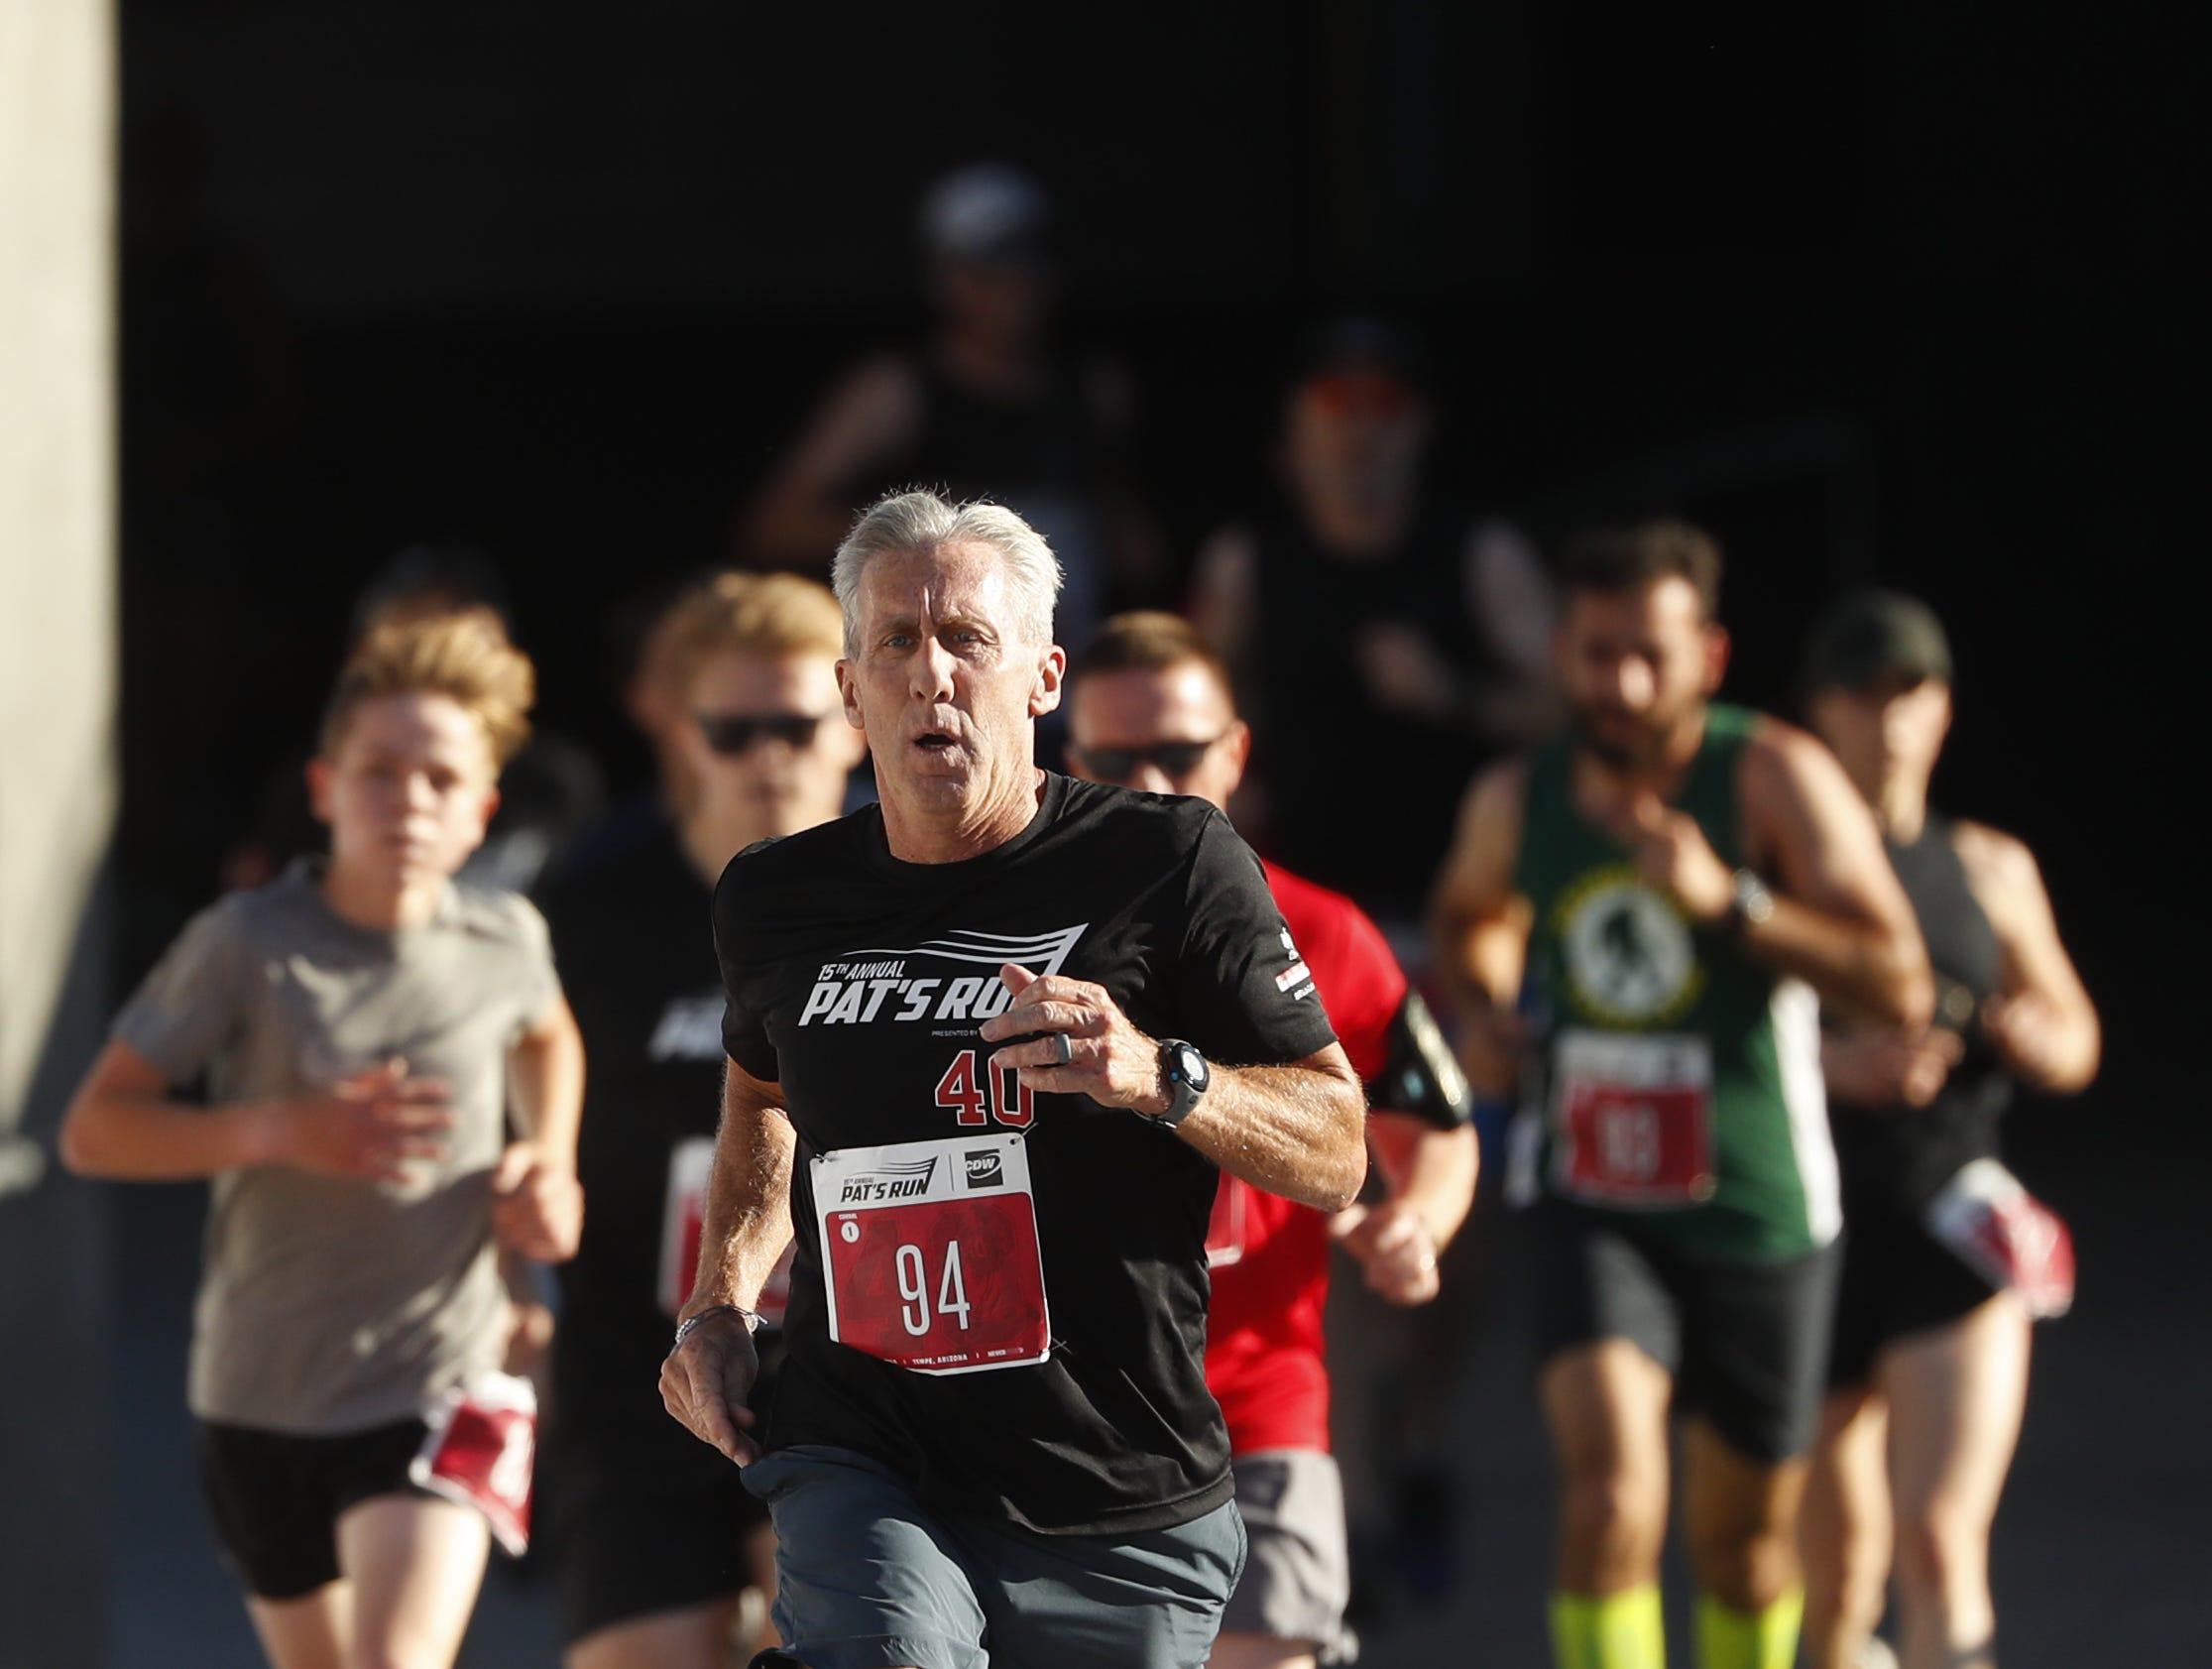 Runners finish up the last stretch of Pat's Run 2019 inside Sun Devil Stadium in Tempe, Ariz. on April 27, 2019.